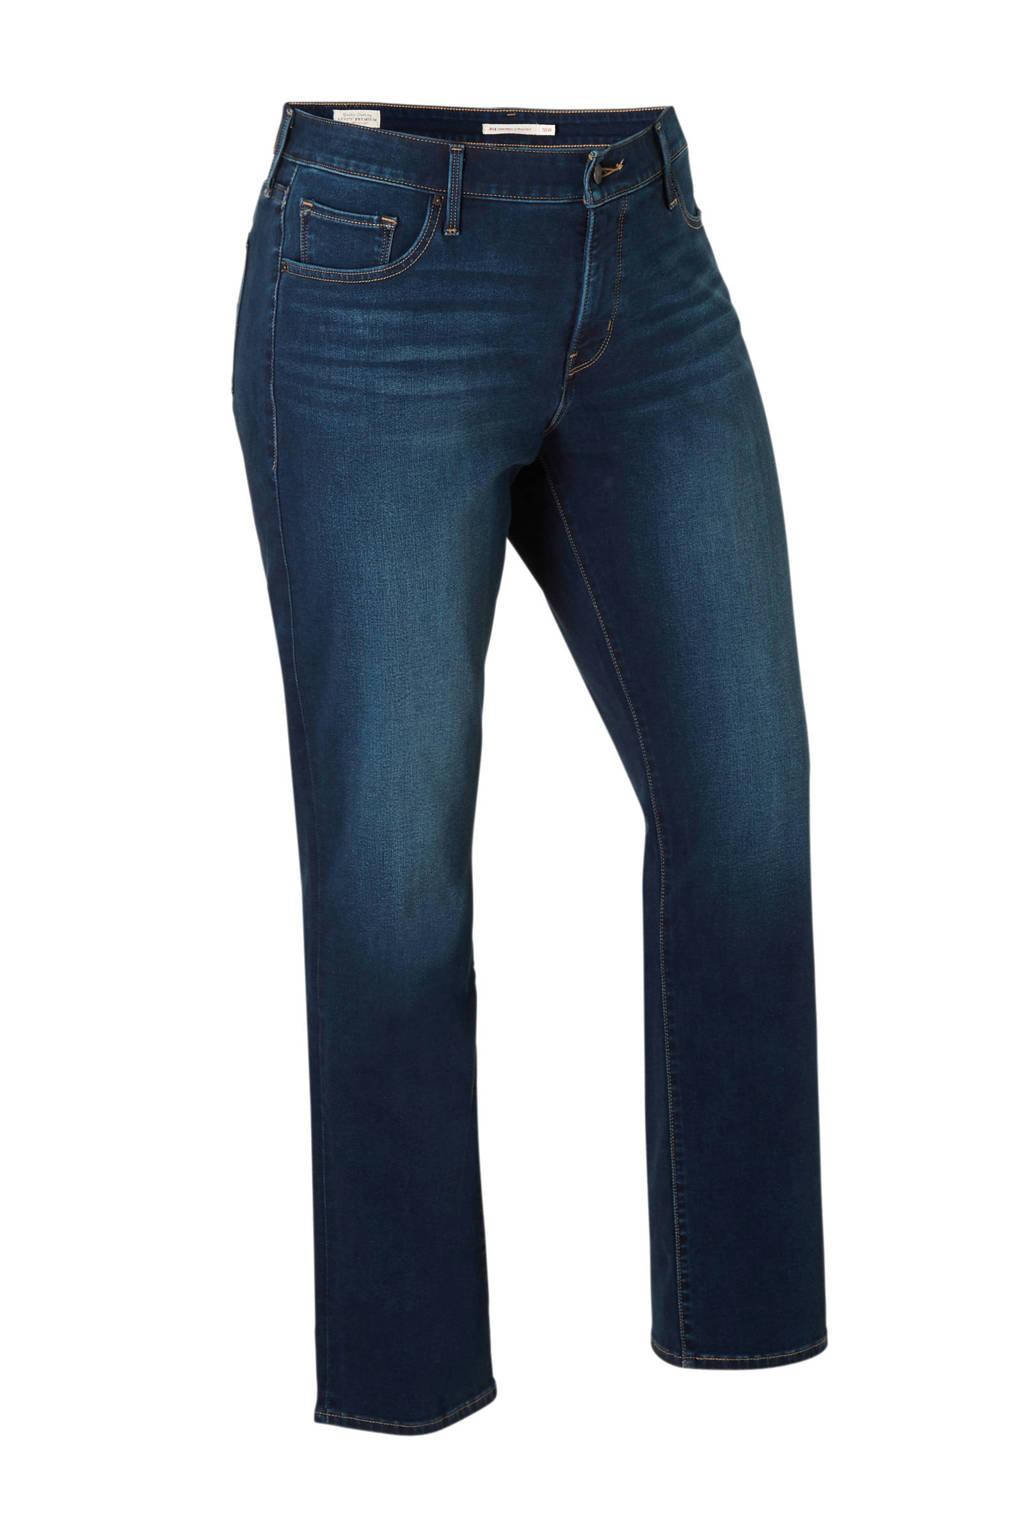 Levi's Plus straight fit jeans, Dark denim